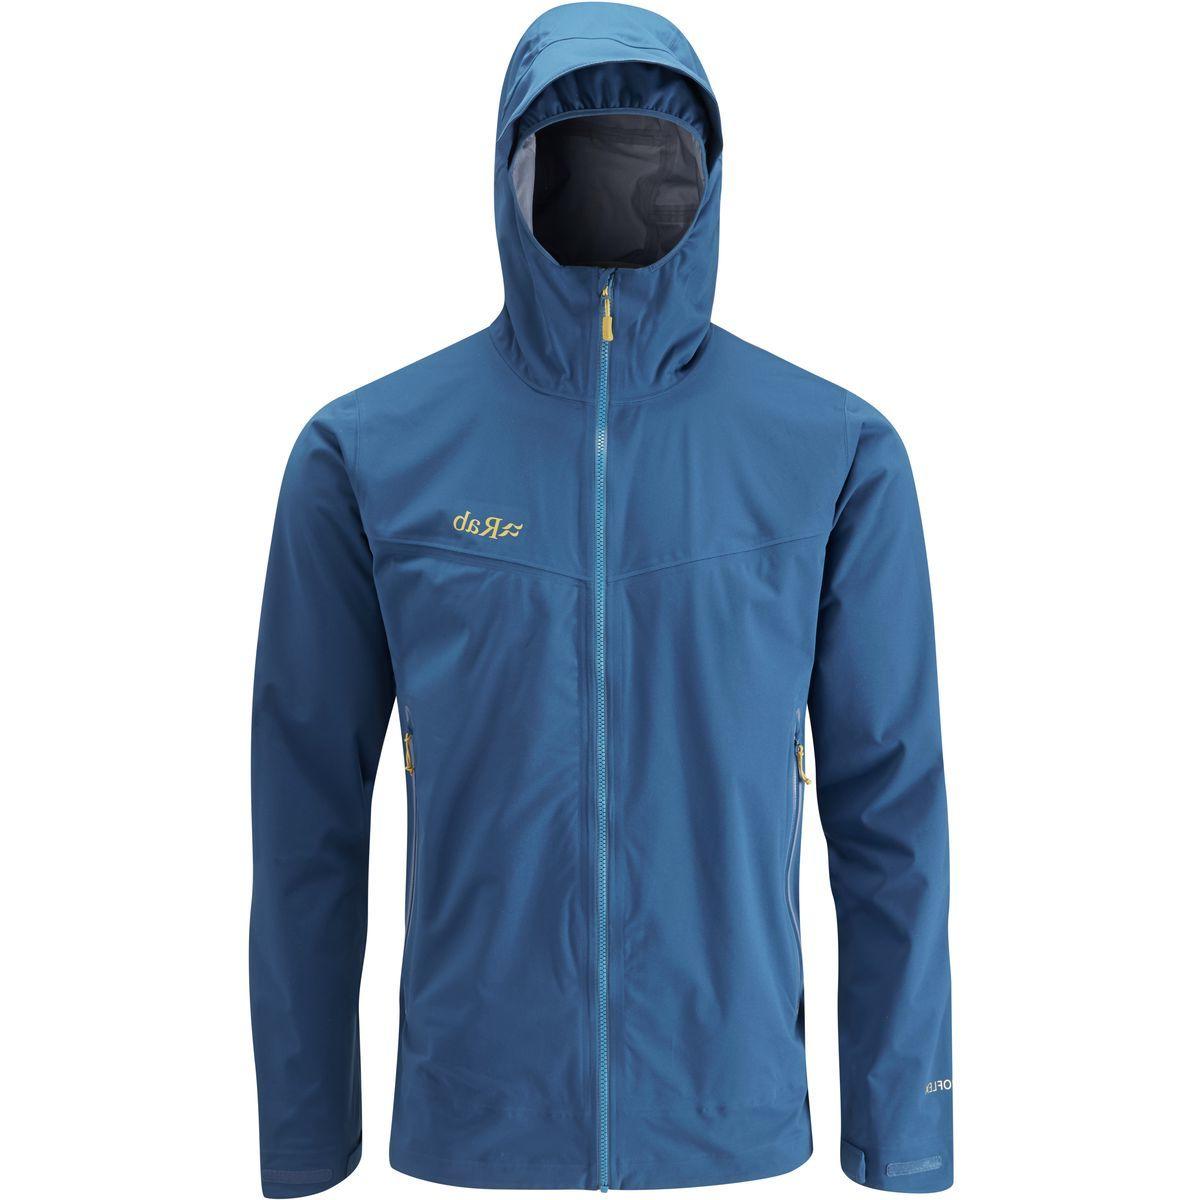 Rab Kinetic Plus Jacket - Men's